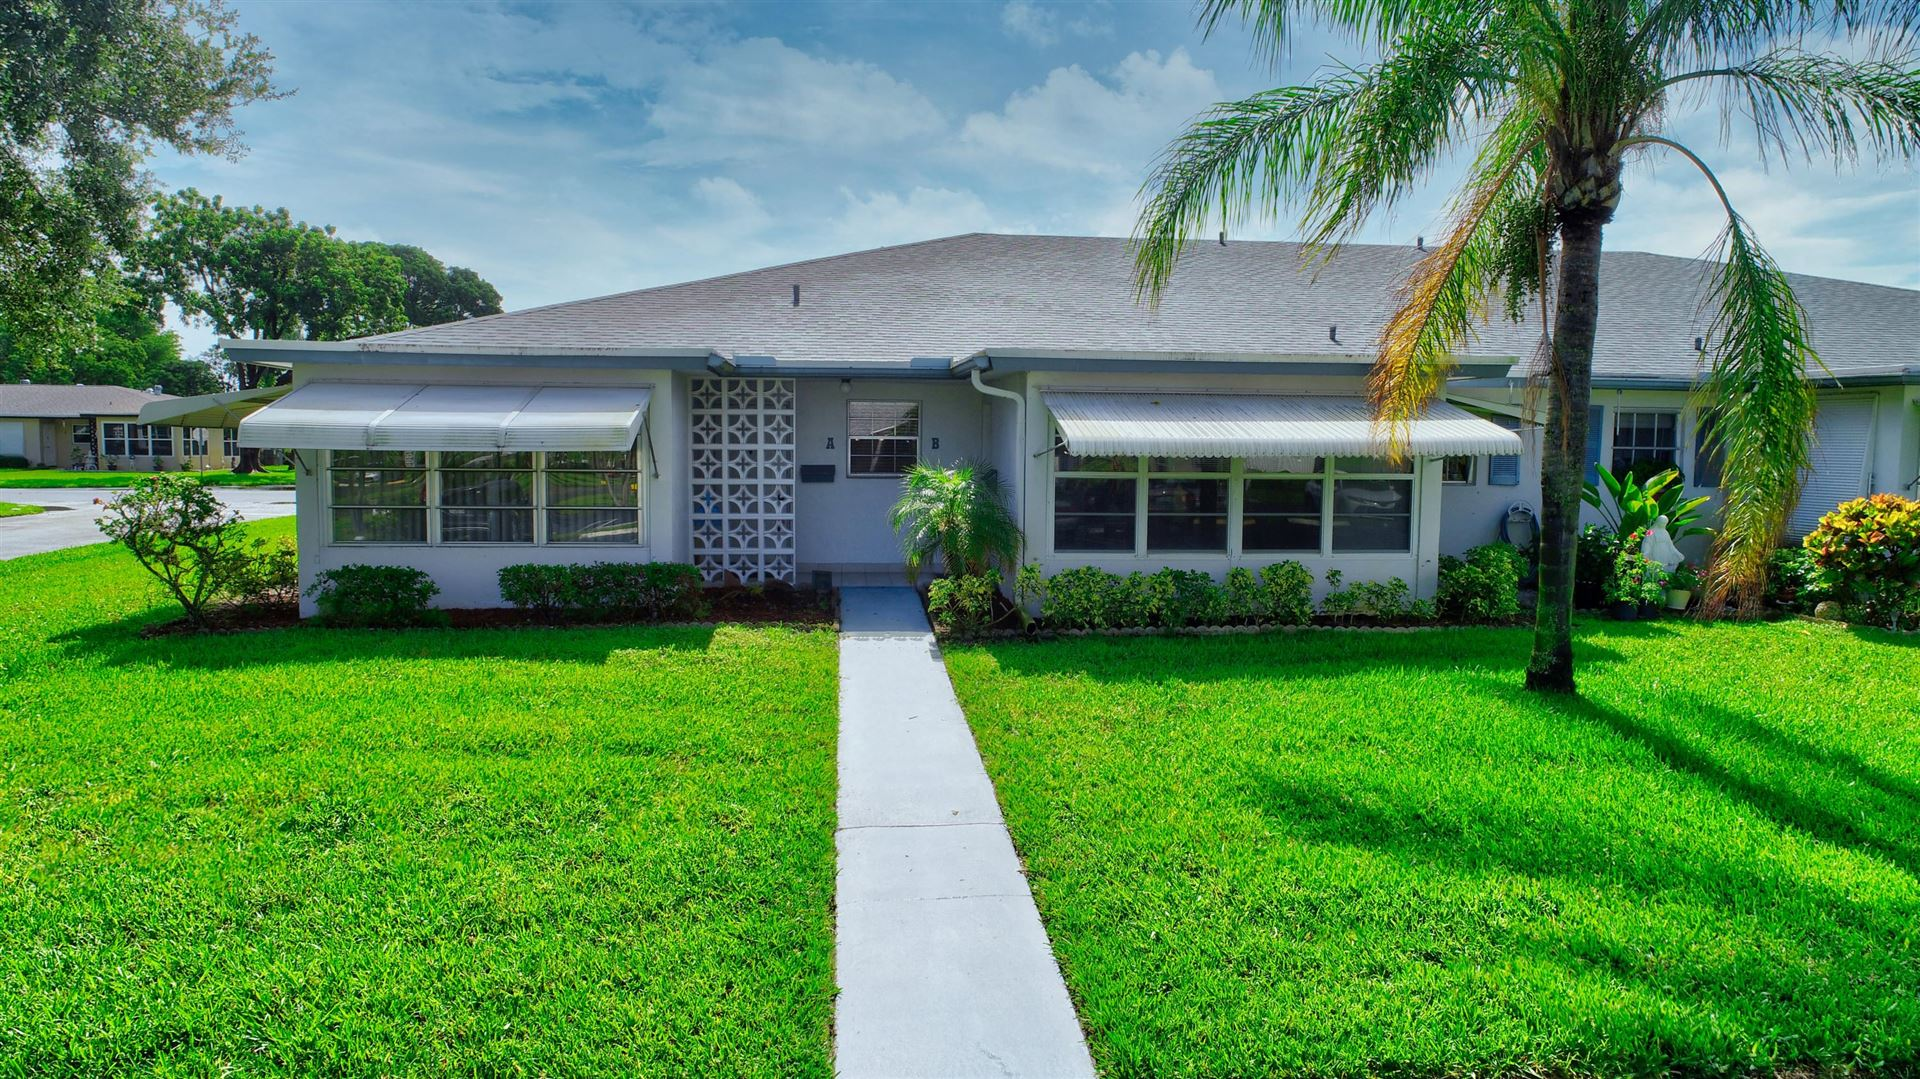 Photo for 1110 Circle Terrace W #A, Delray Beach, FL 33445 (MLS # RX-10624891)